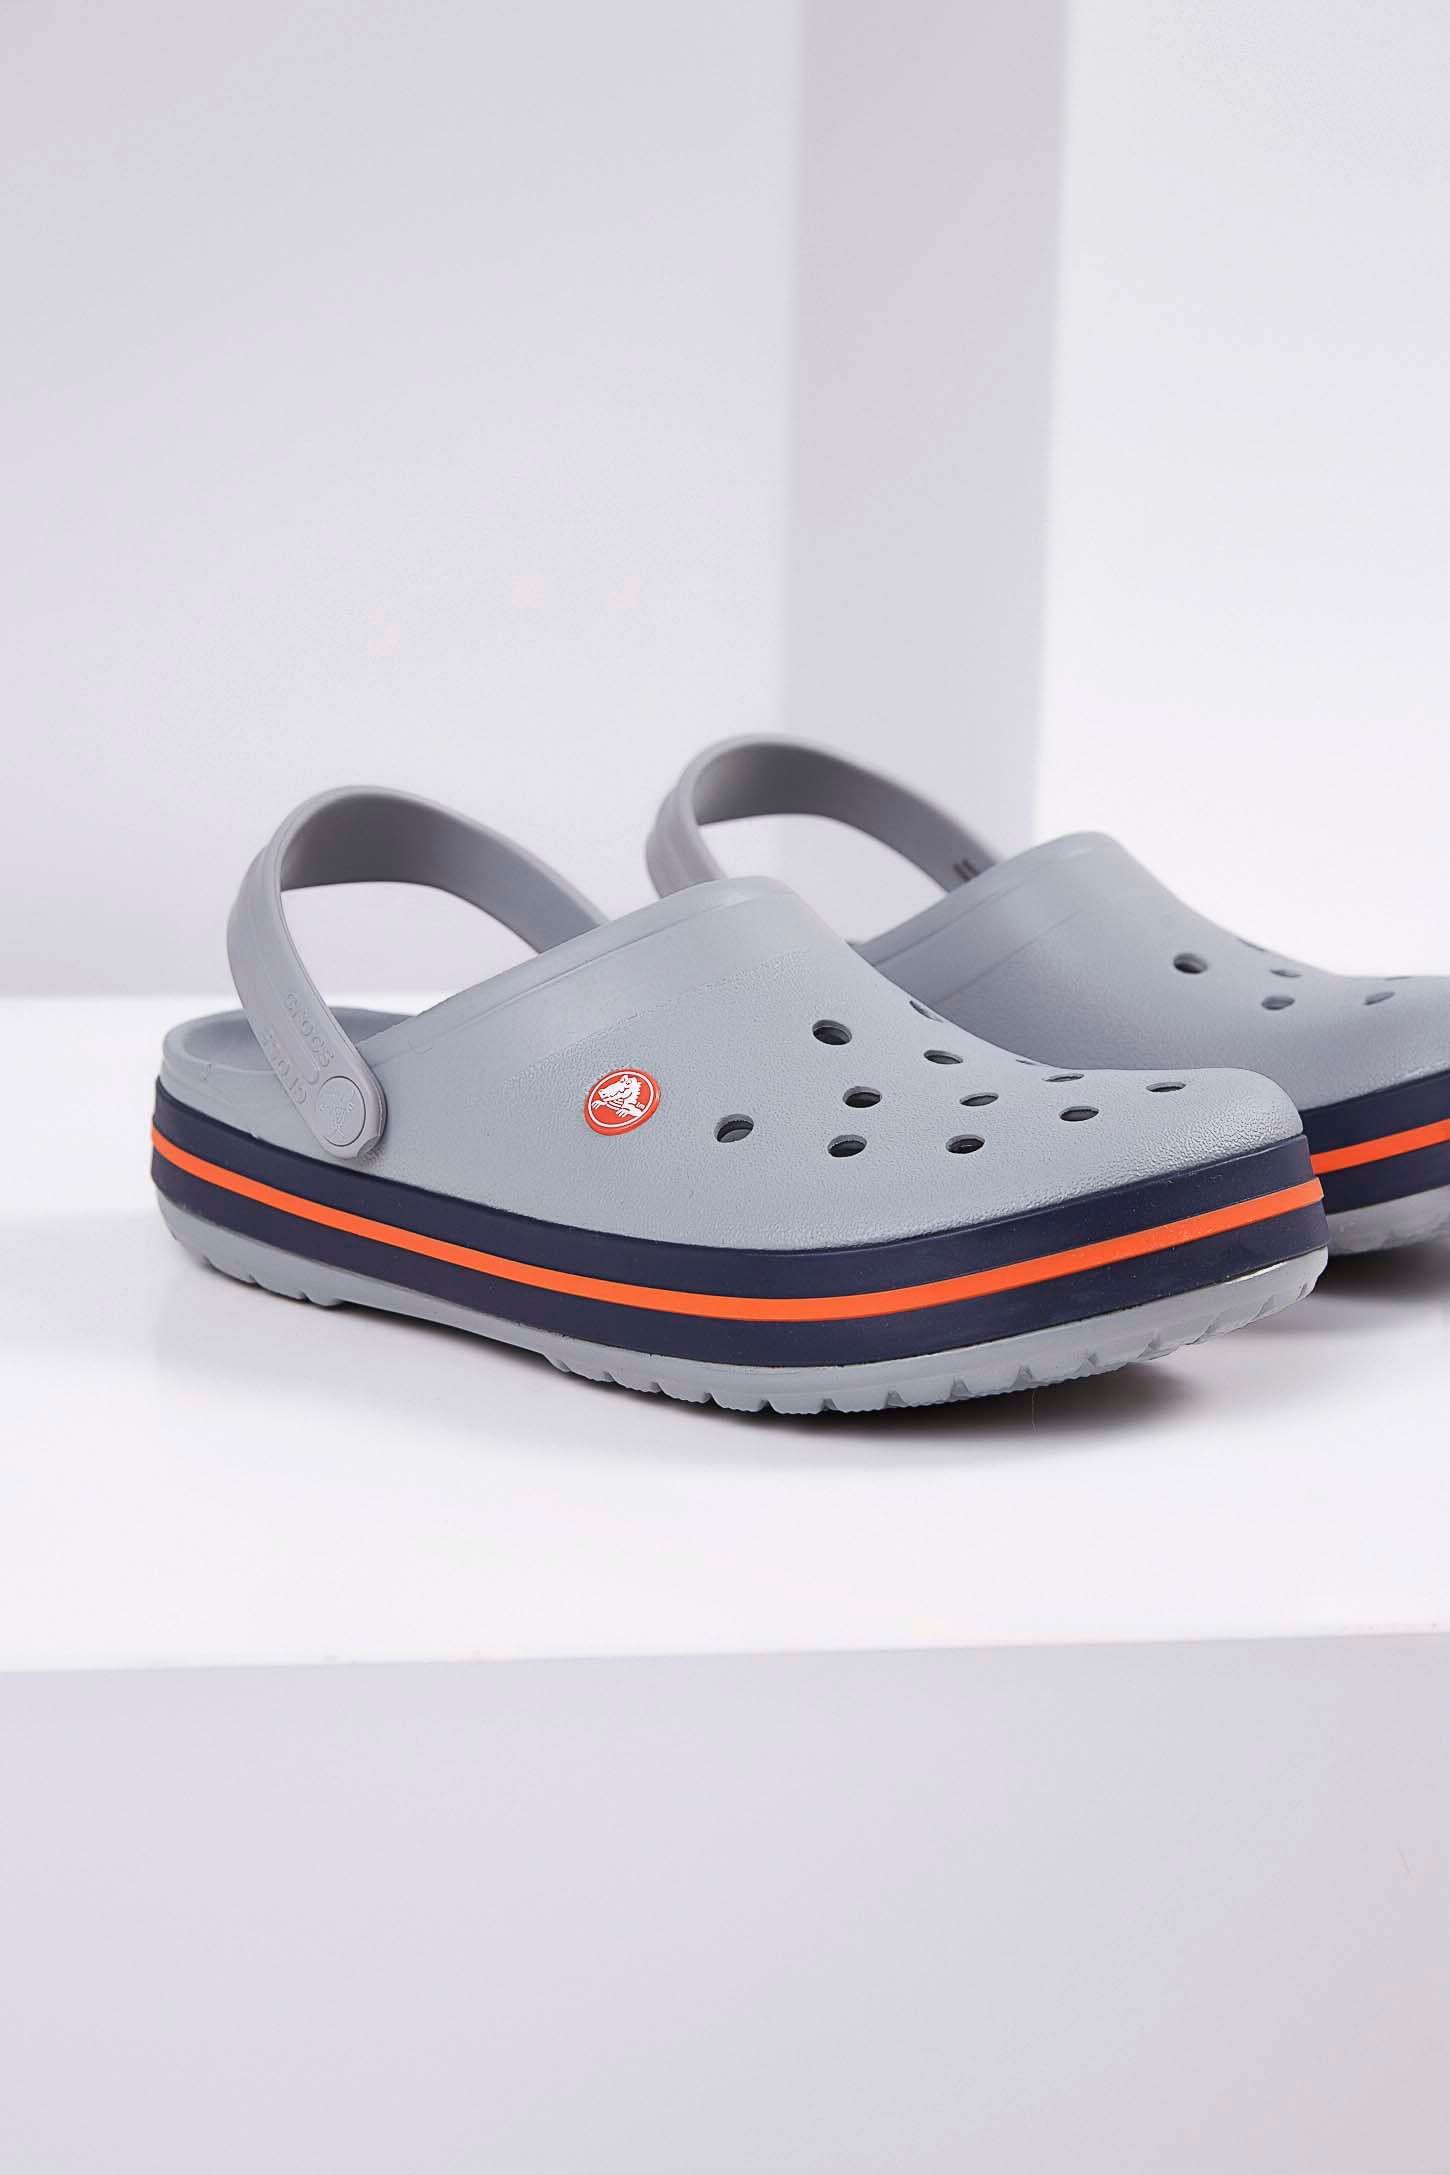 Sandalia-Crocs-11016-Cinza